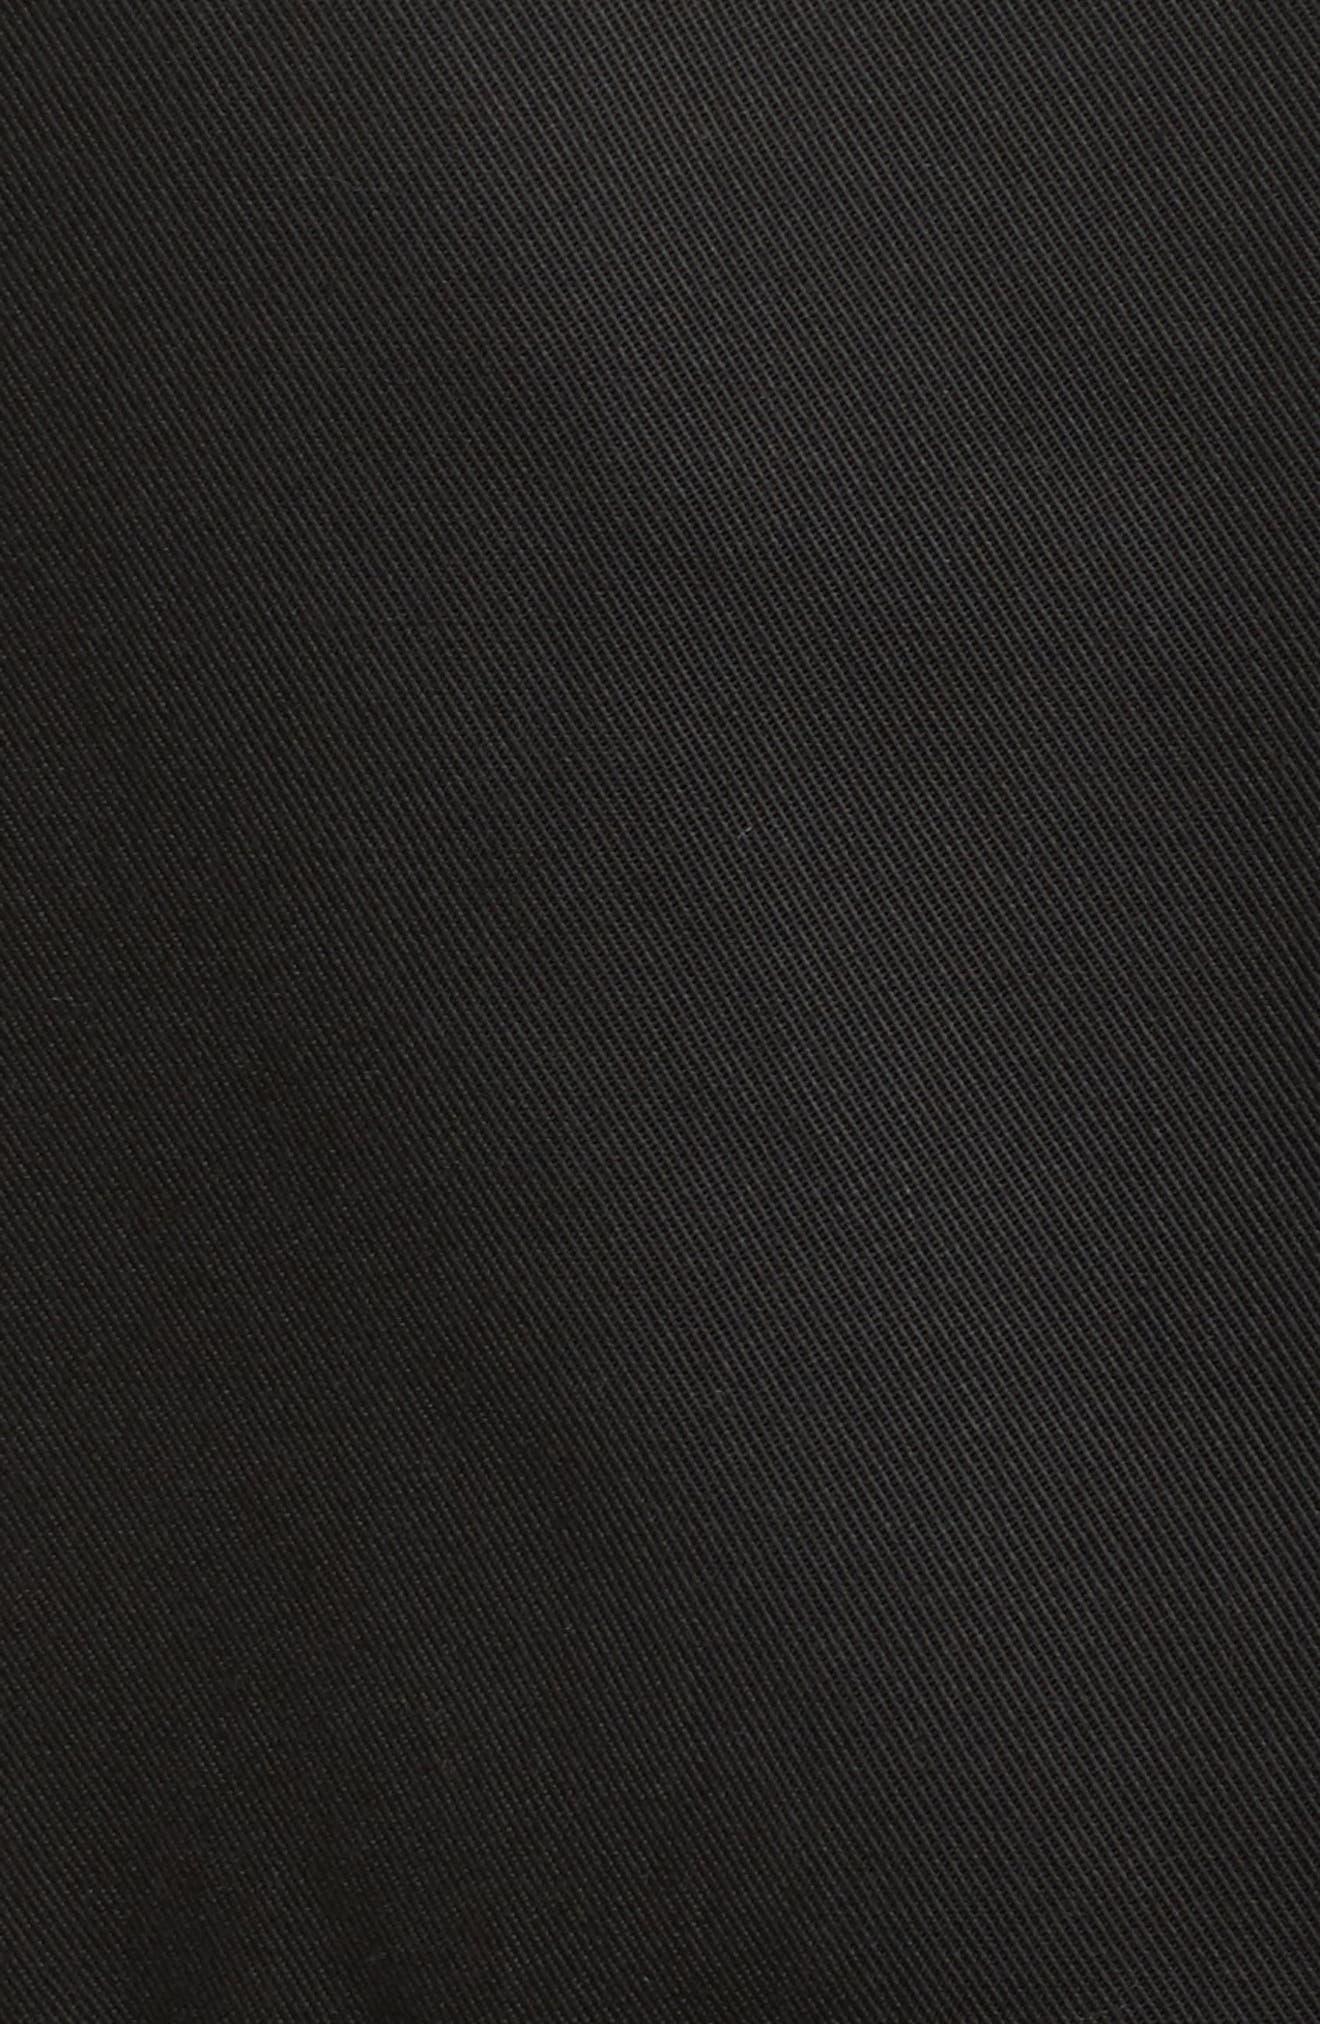 Ruffle Wrap Dress,                             Alternate thumbnail 5, color,                             Black